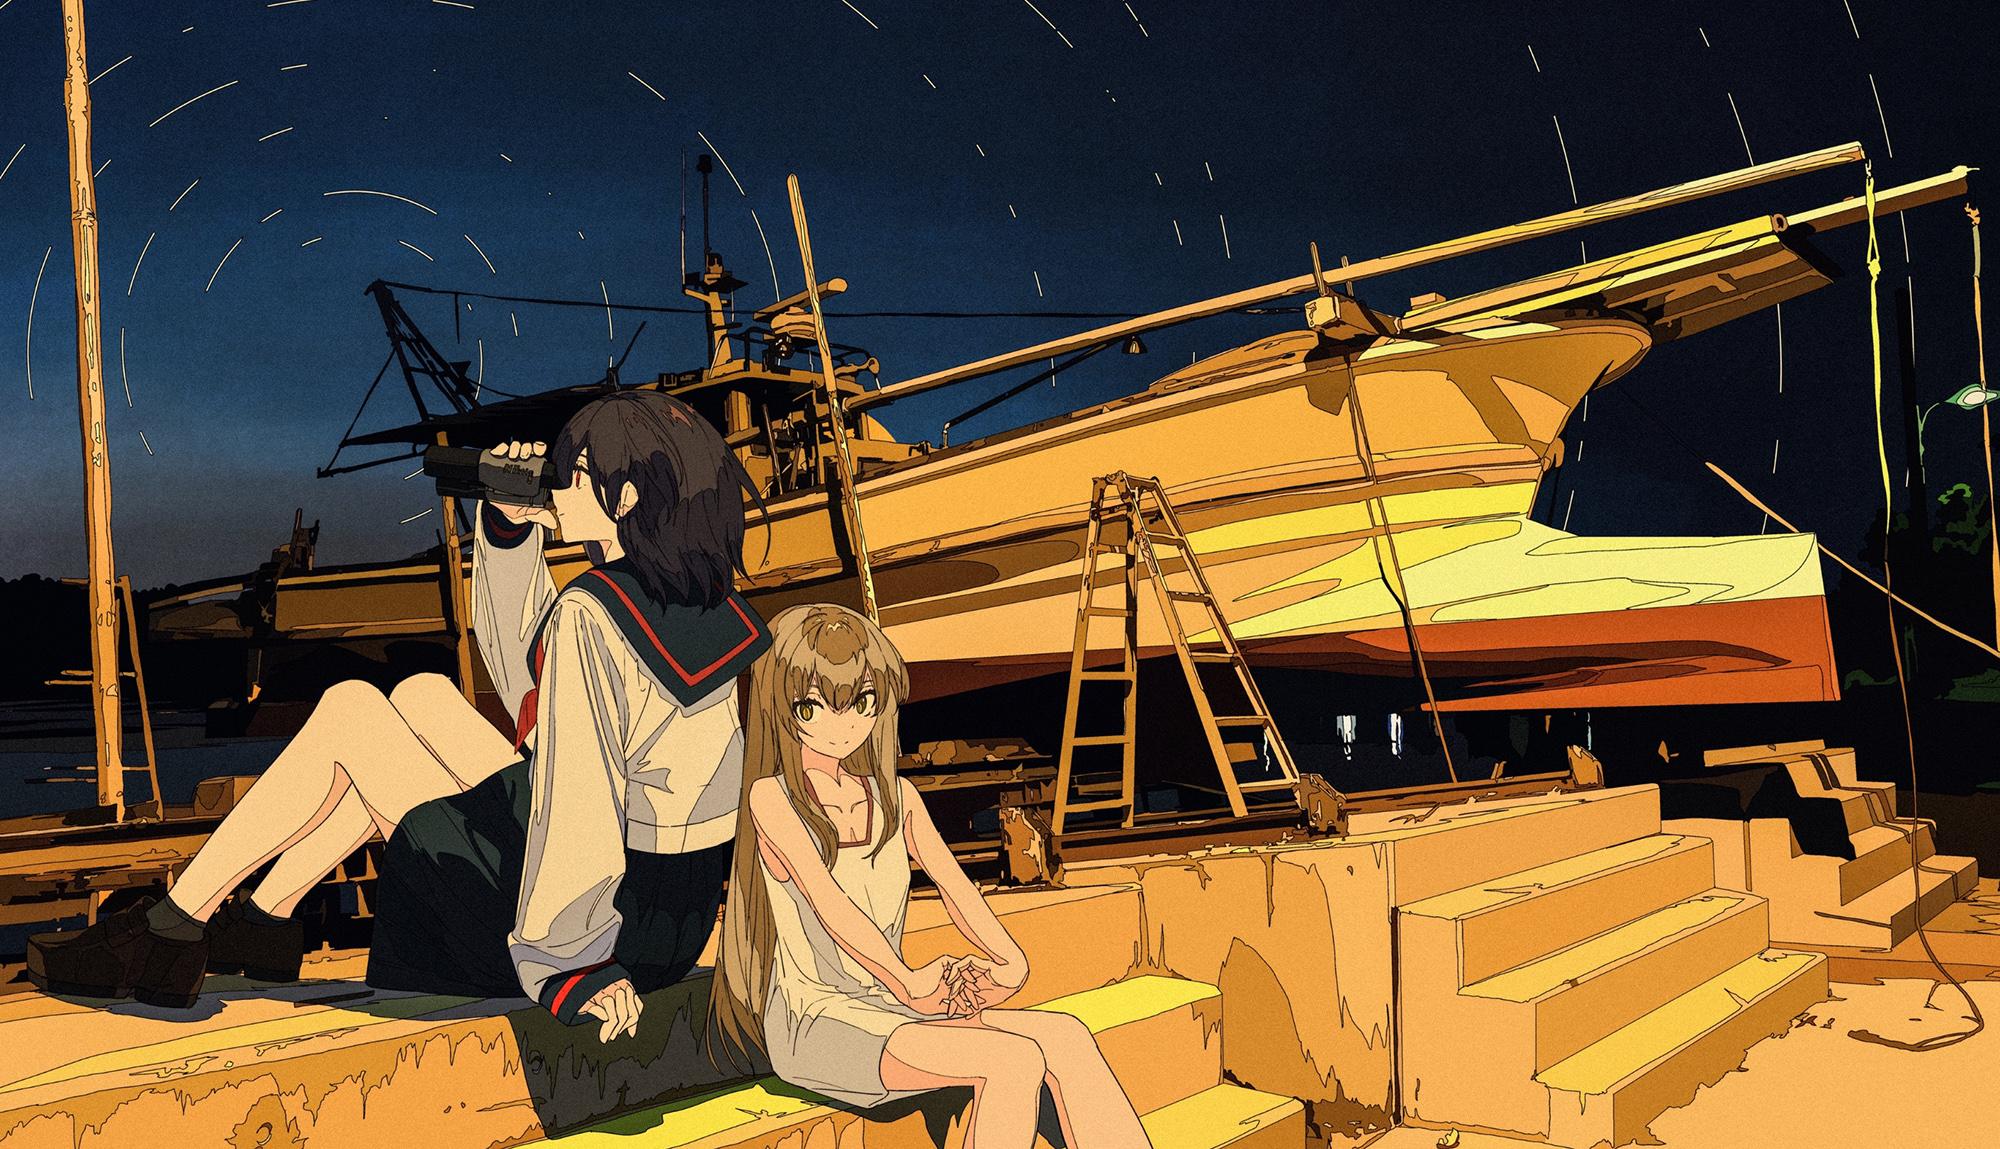 Anime Cogecha Artwork Anime Girls School Uniform Dress Ship Boat 2000x1149